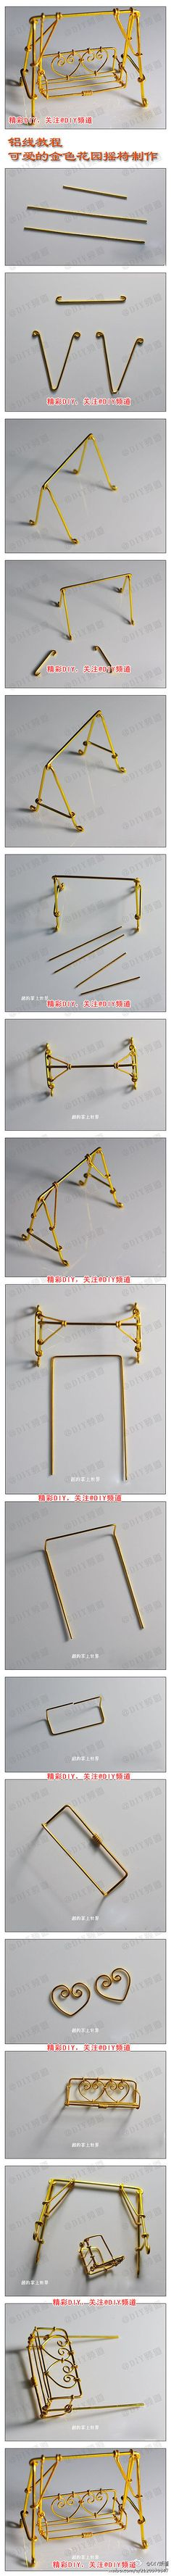 Miniature wire swingset DIY 手工 教程 DIY 嘀咕图片